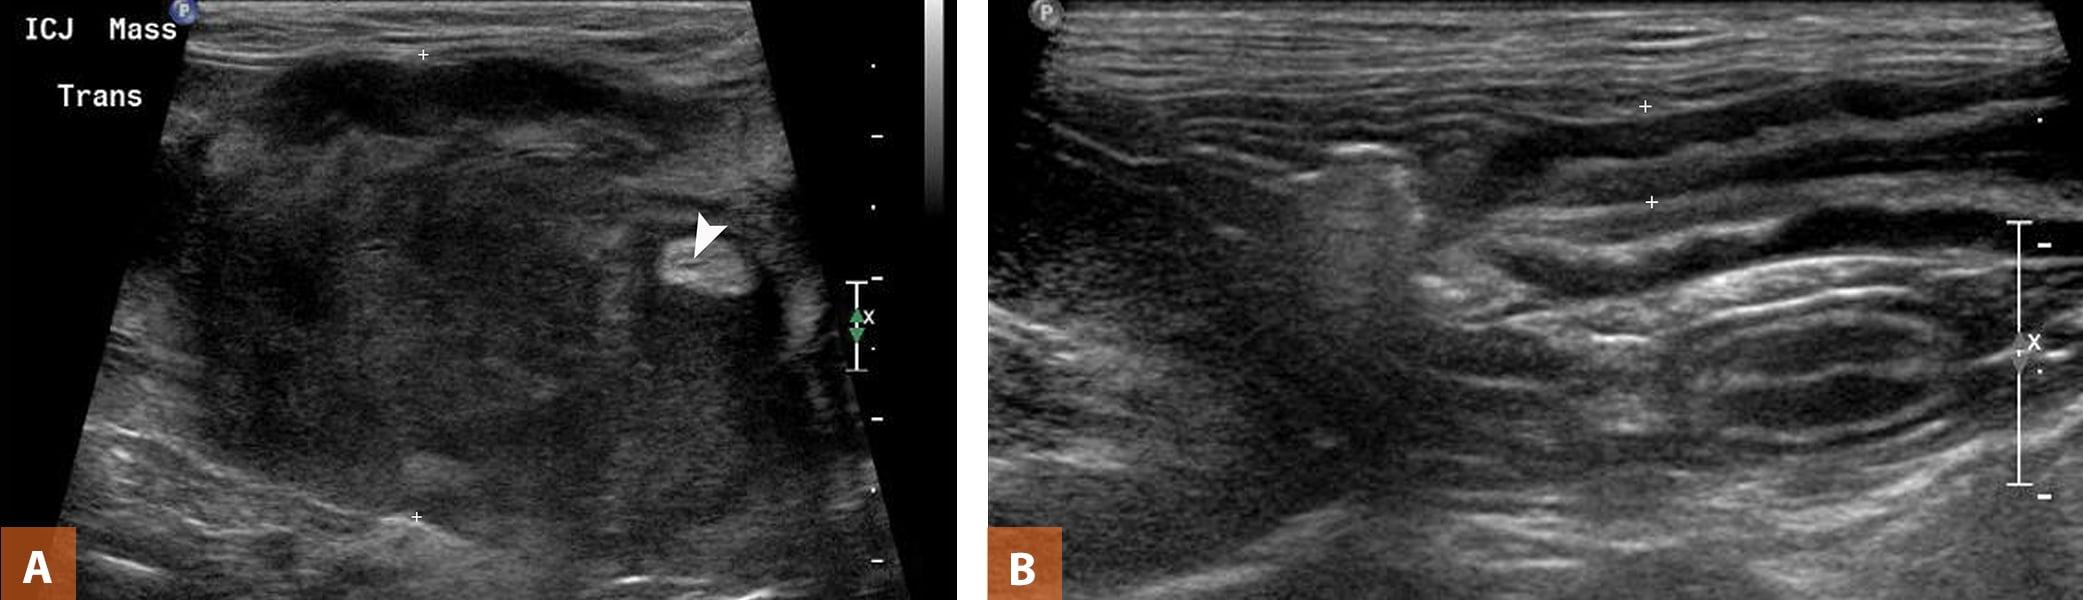 Ultrasonography Of The Gastrointestinal Tract Ileum Cecum Colon Today S Veterinary Practice